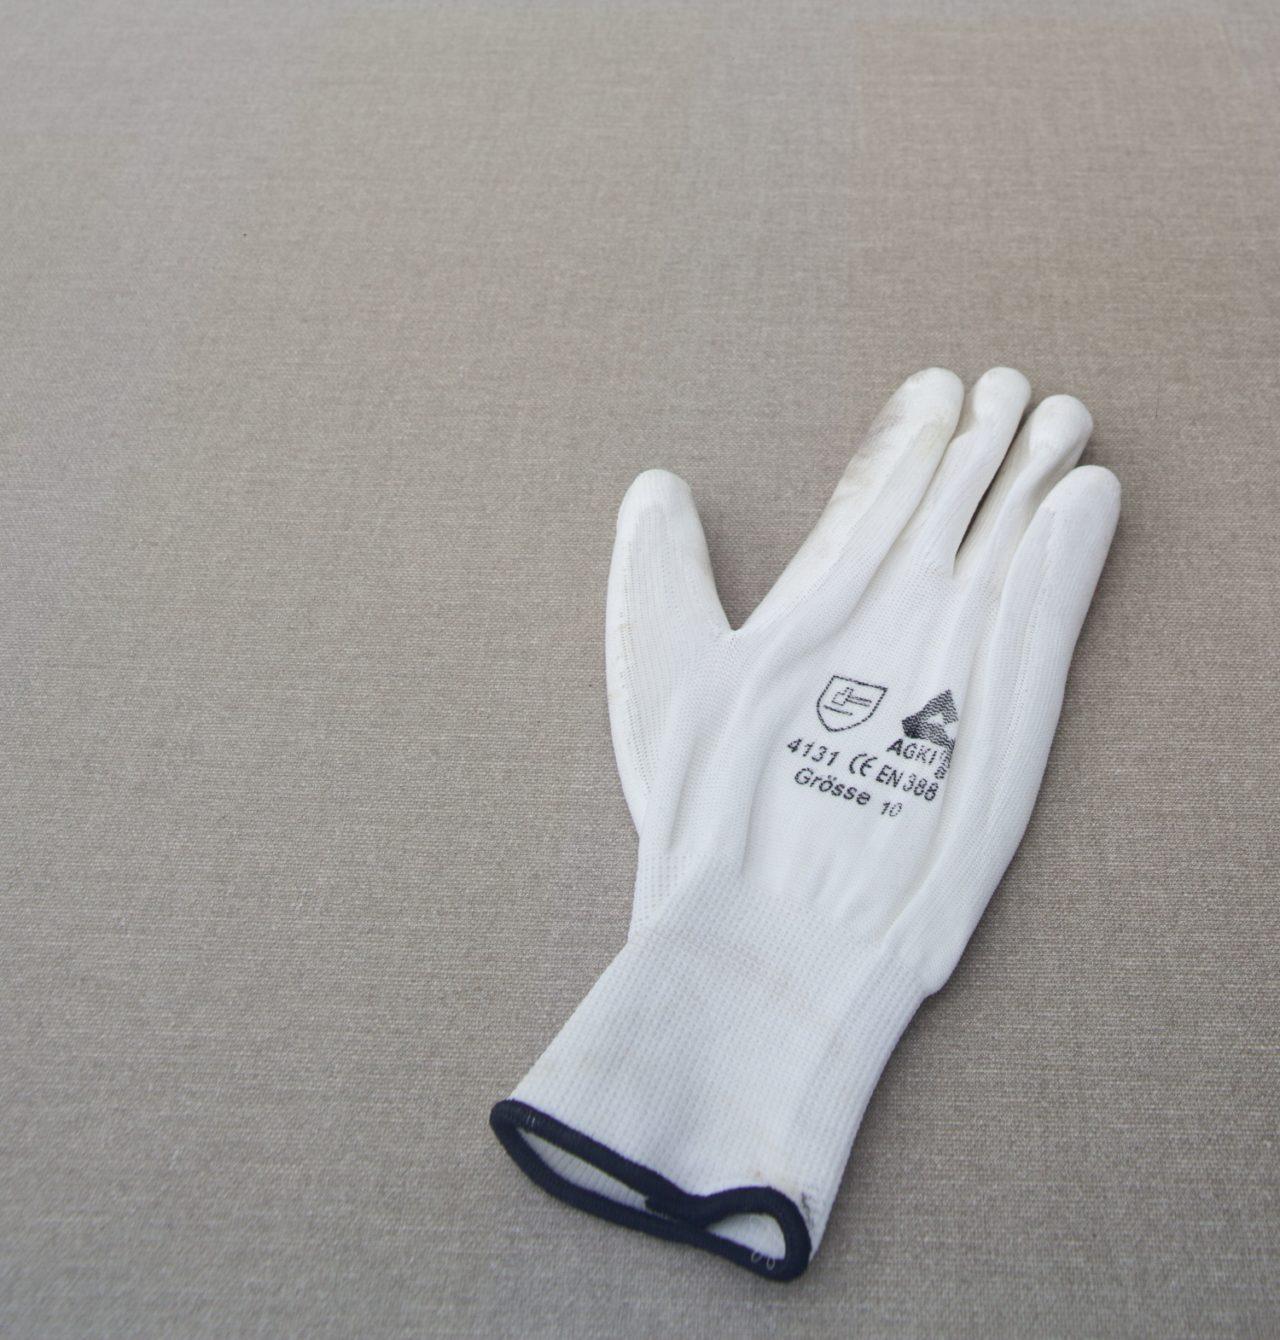 Andreas Slominski, Bid on the white gloves! (2008)